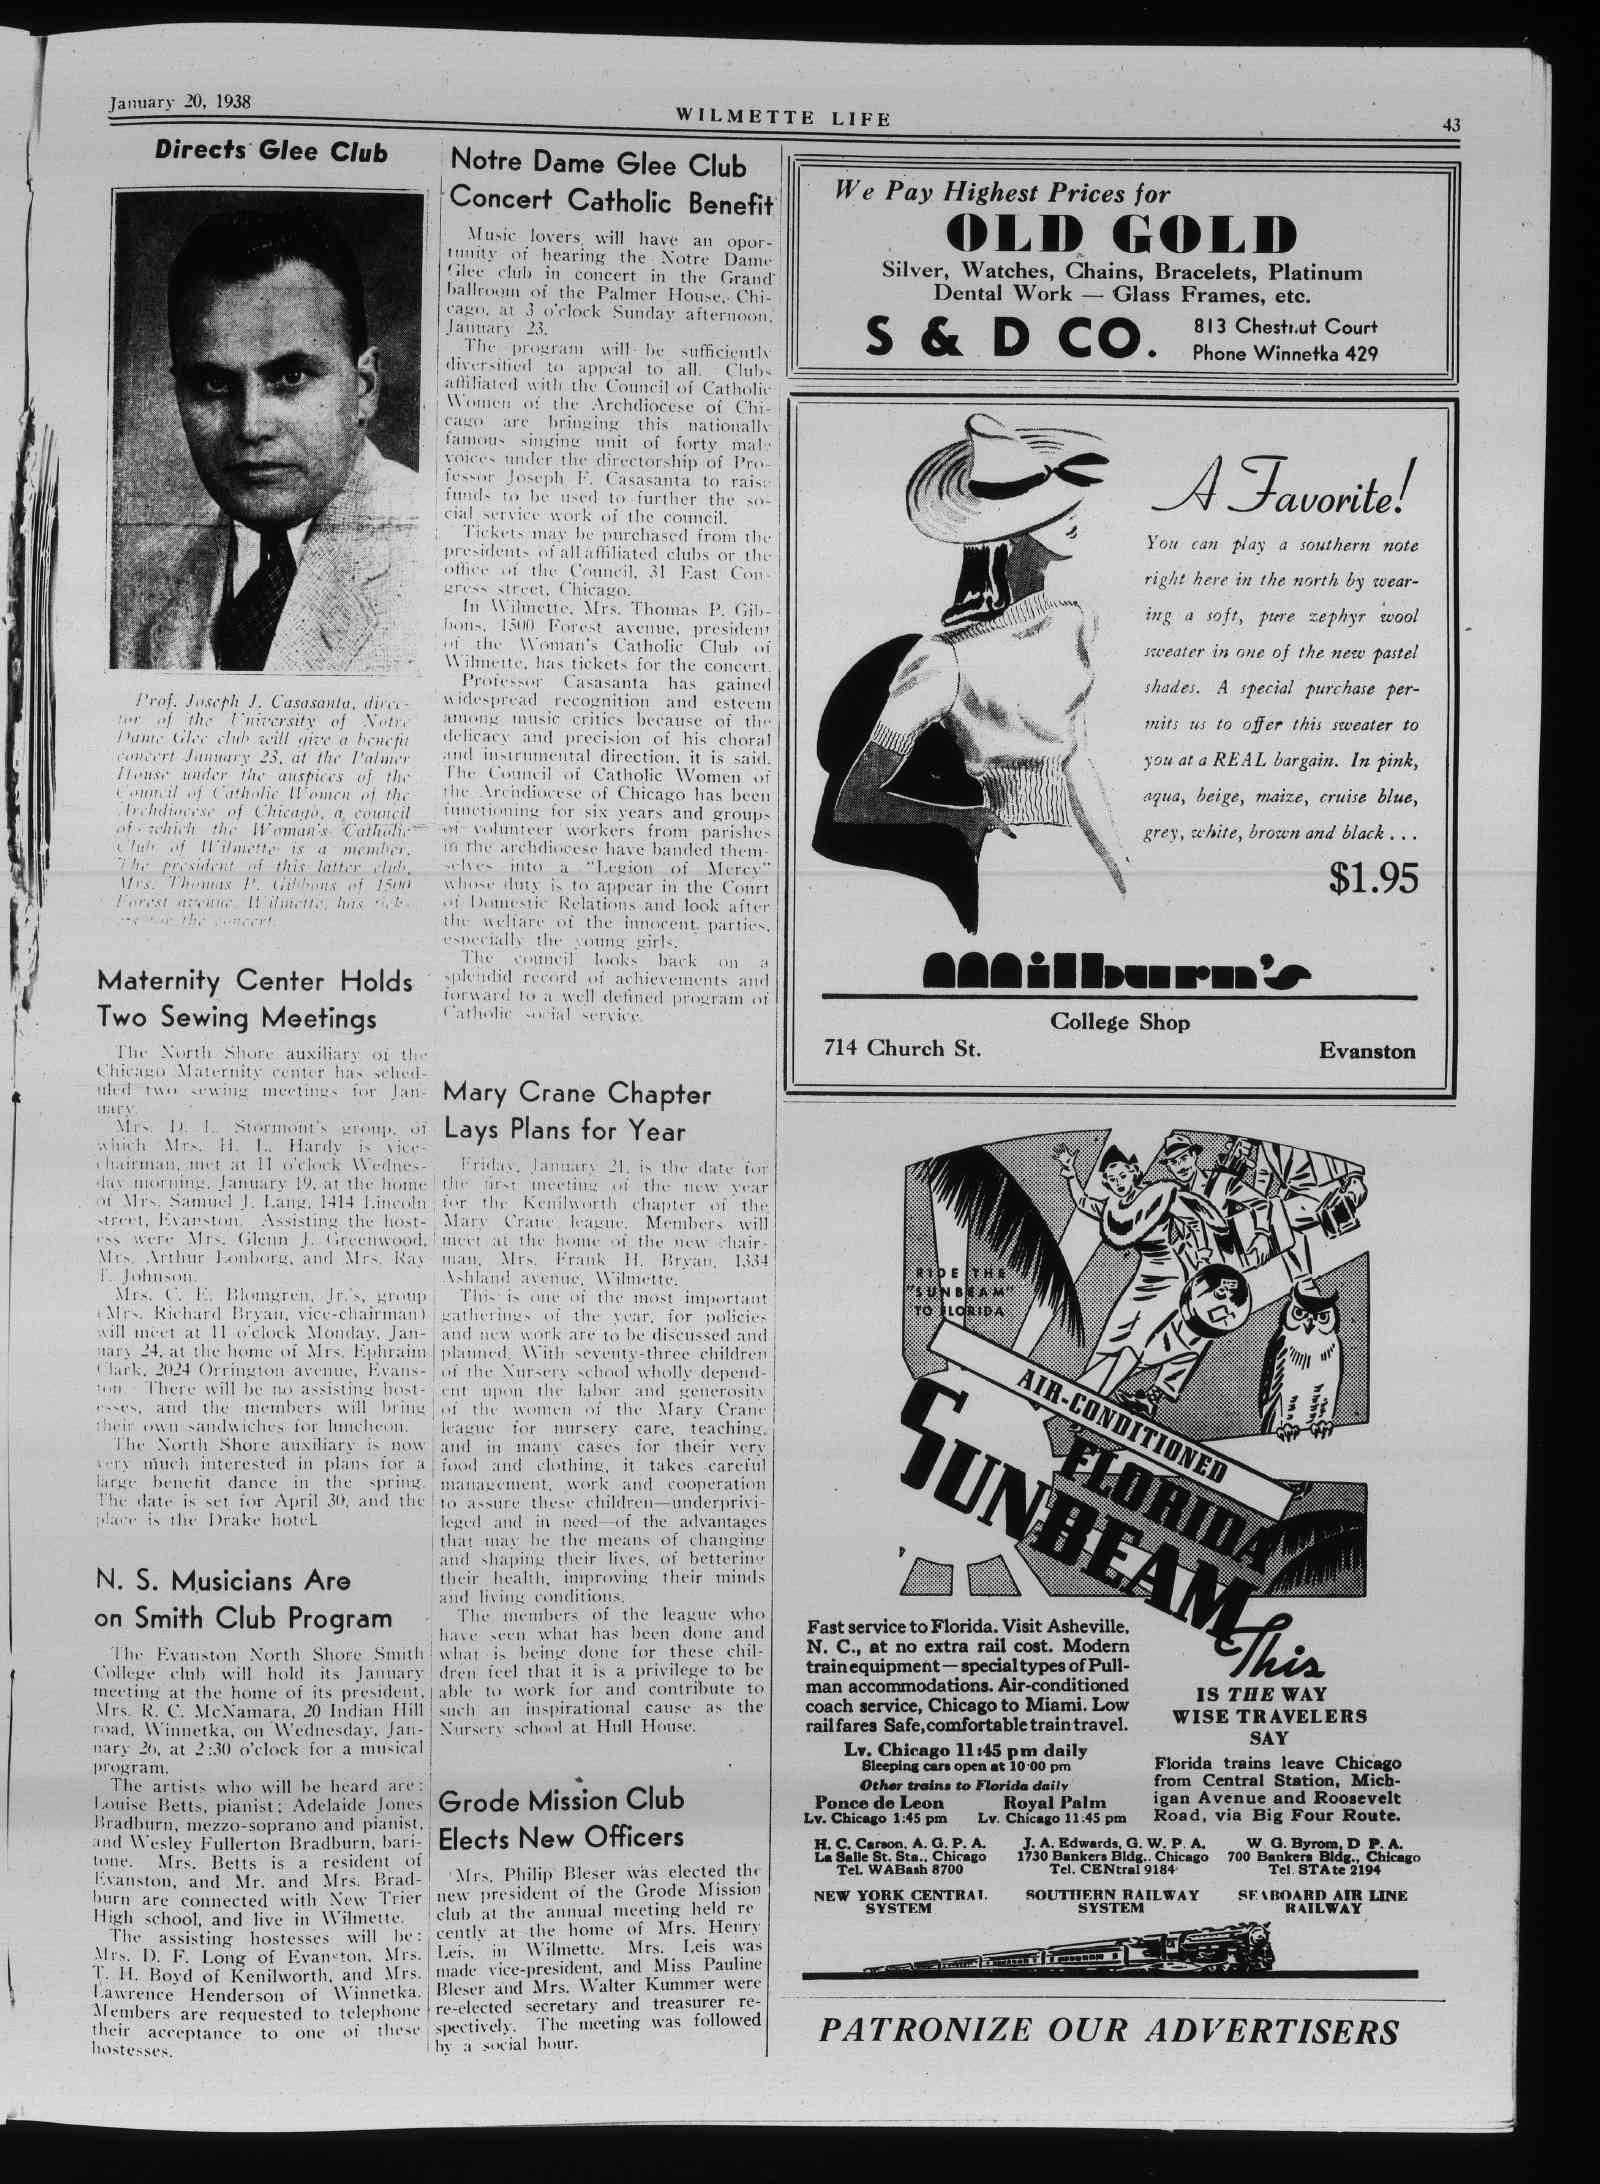 Wilmette Life (Wilmette, Illinois), 20 Jan 1938